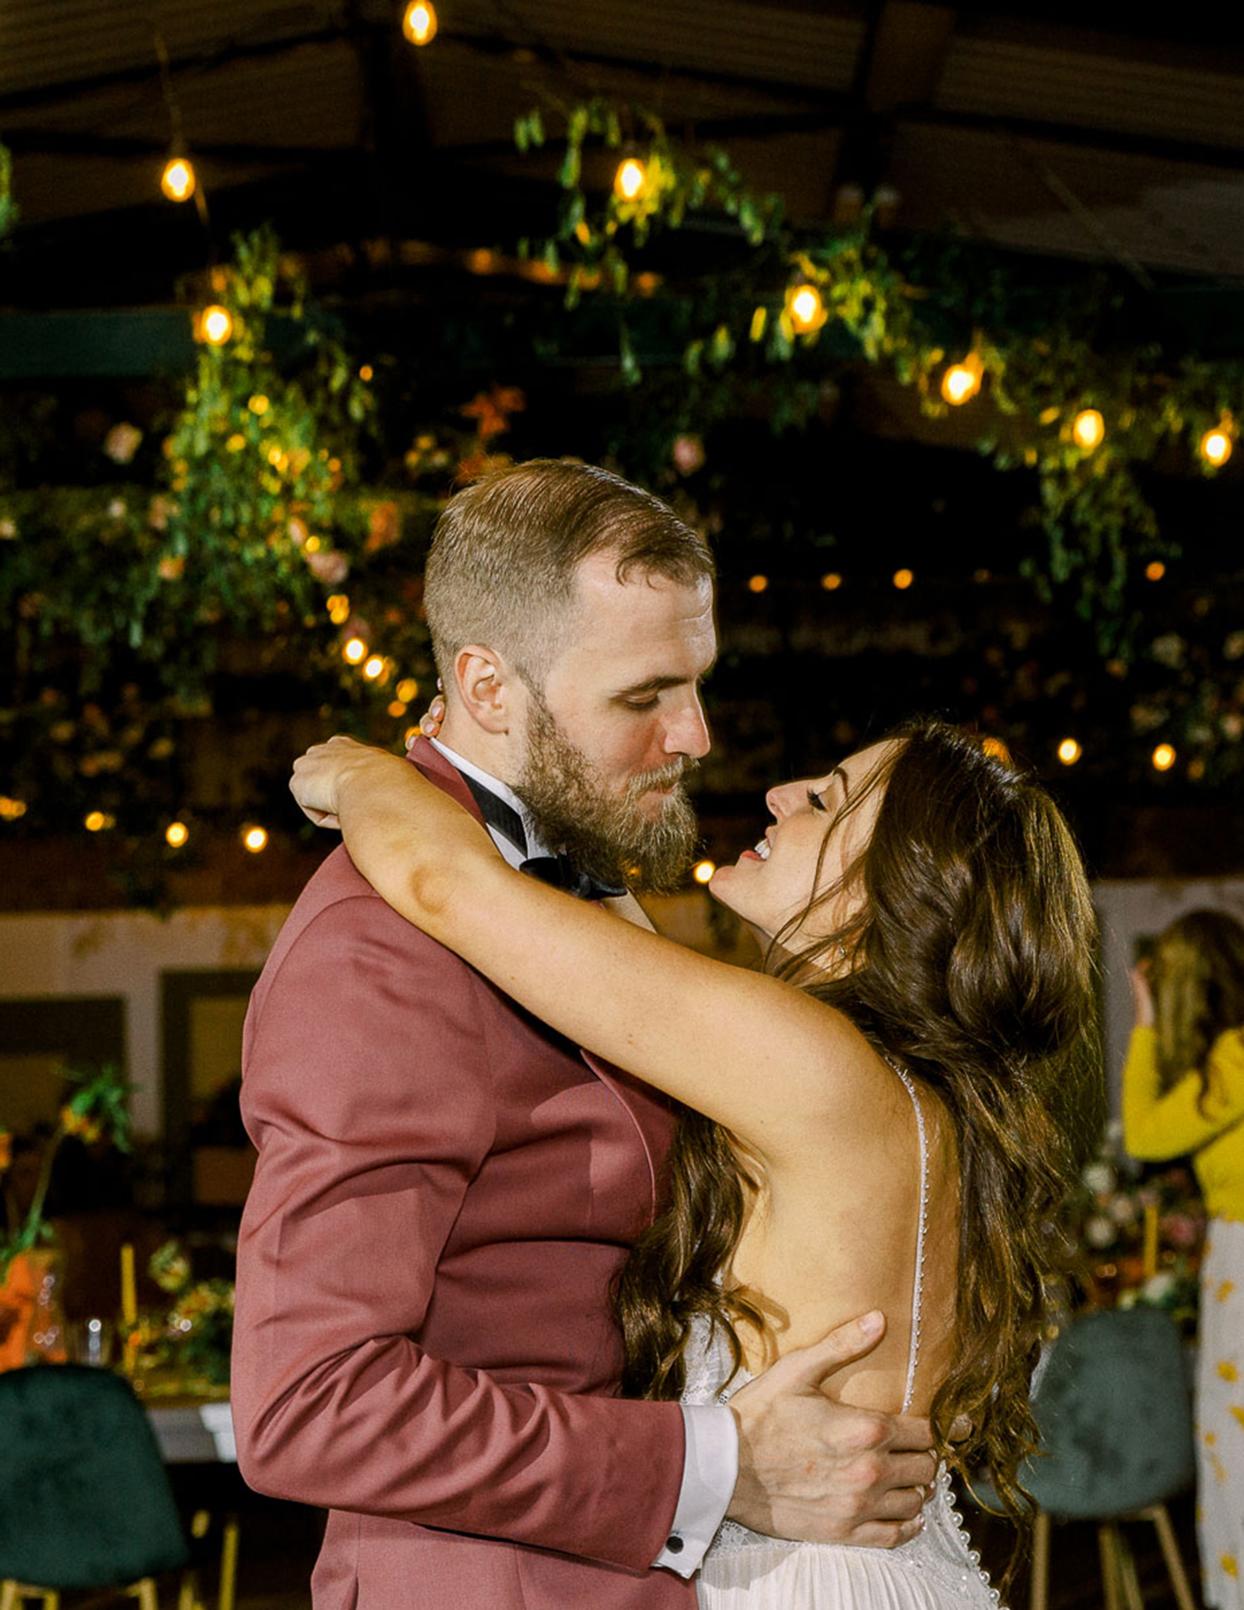 bride and groom dancing smiling